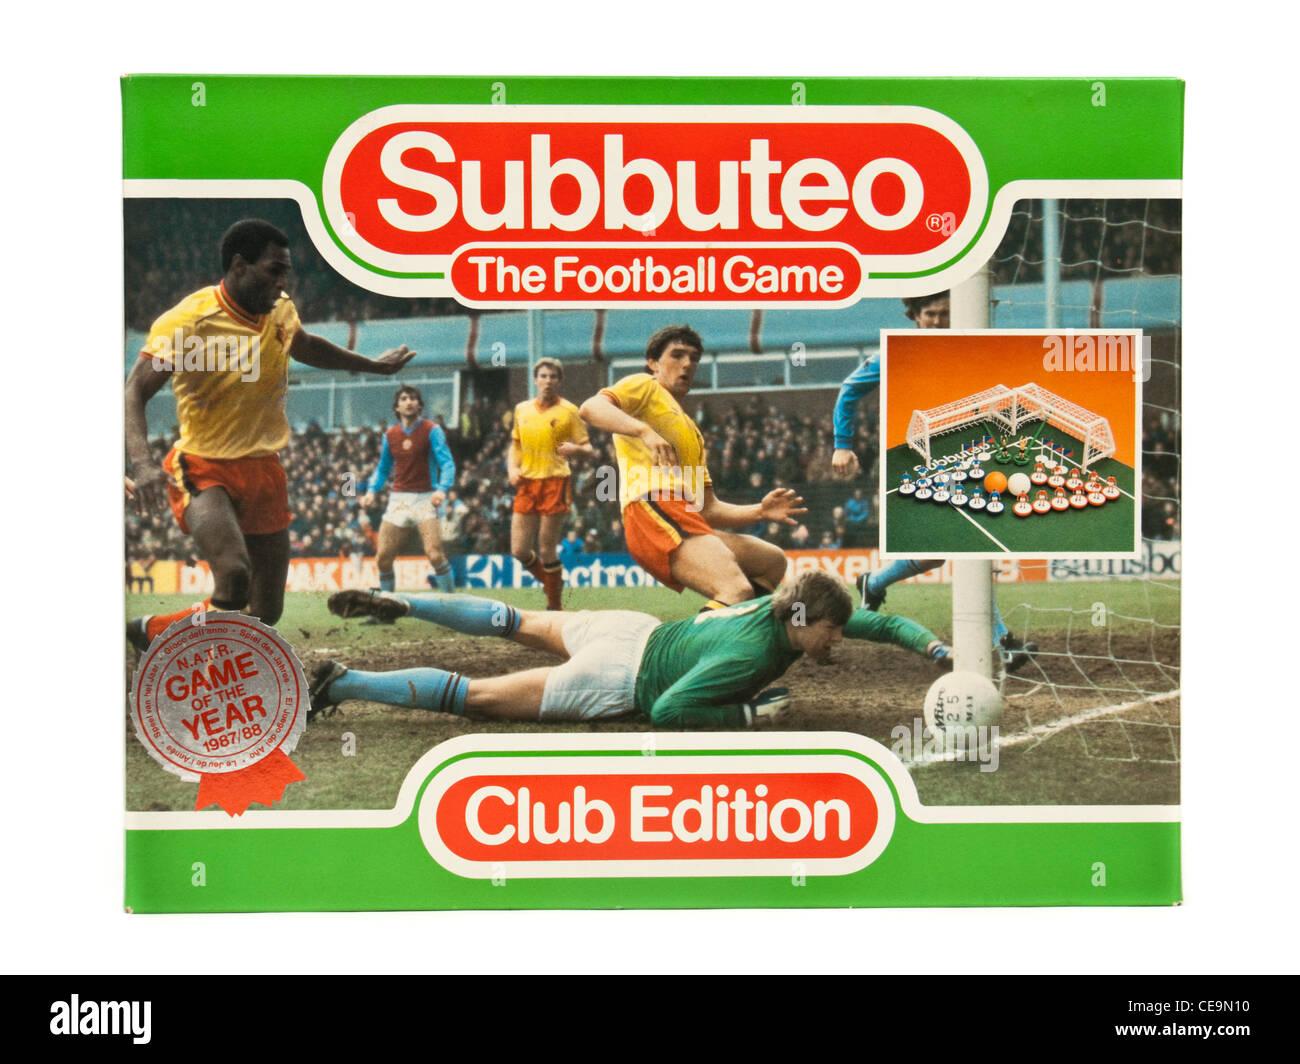 "Jahrgang 1980 Subbuteo ""Club Edition"" Fußball-Spiel Stockbild"